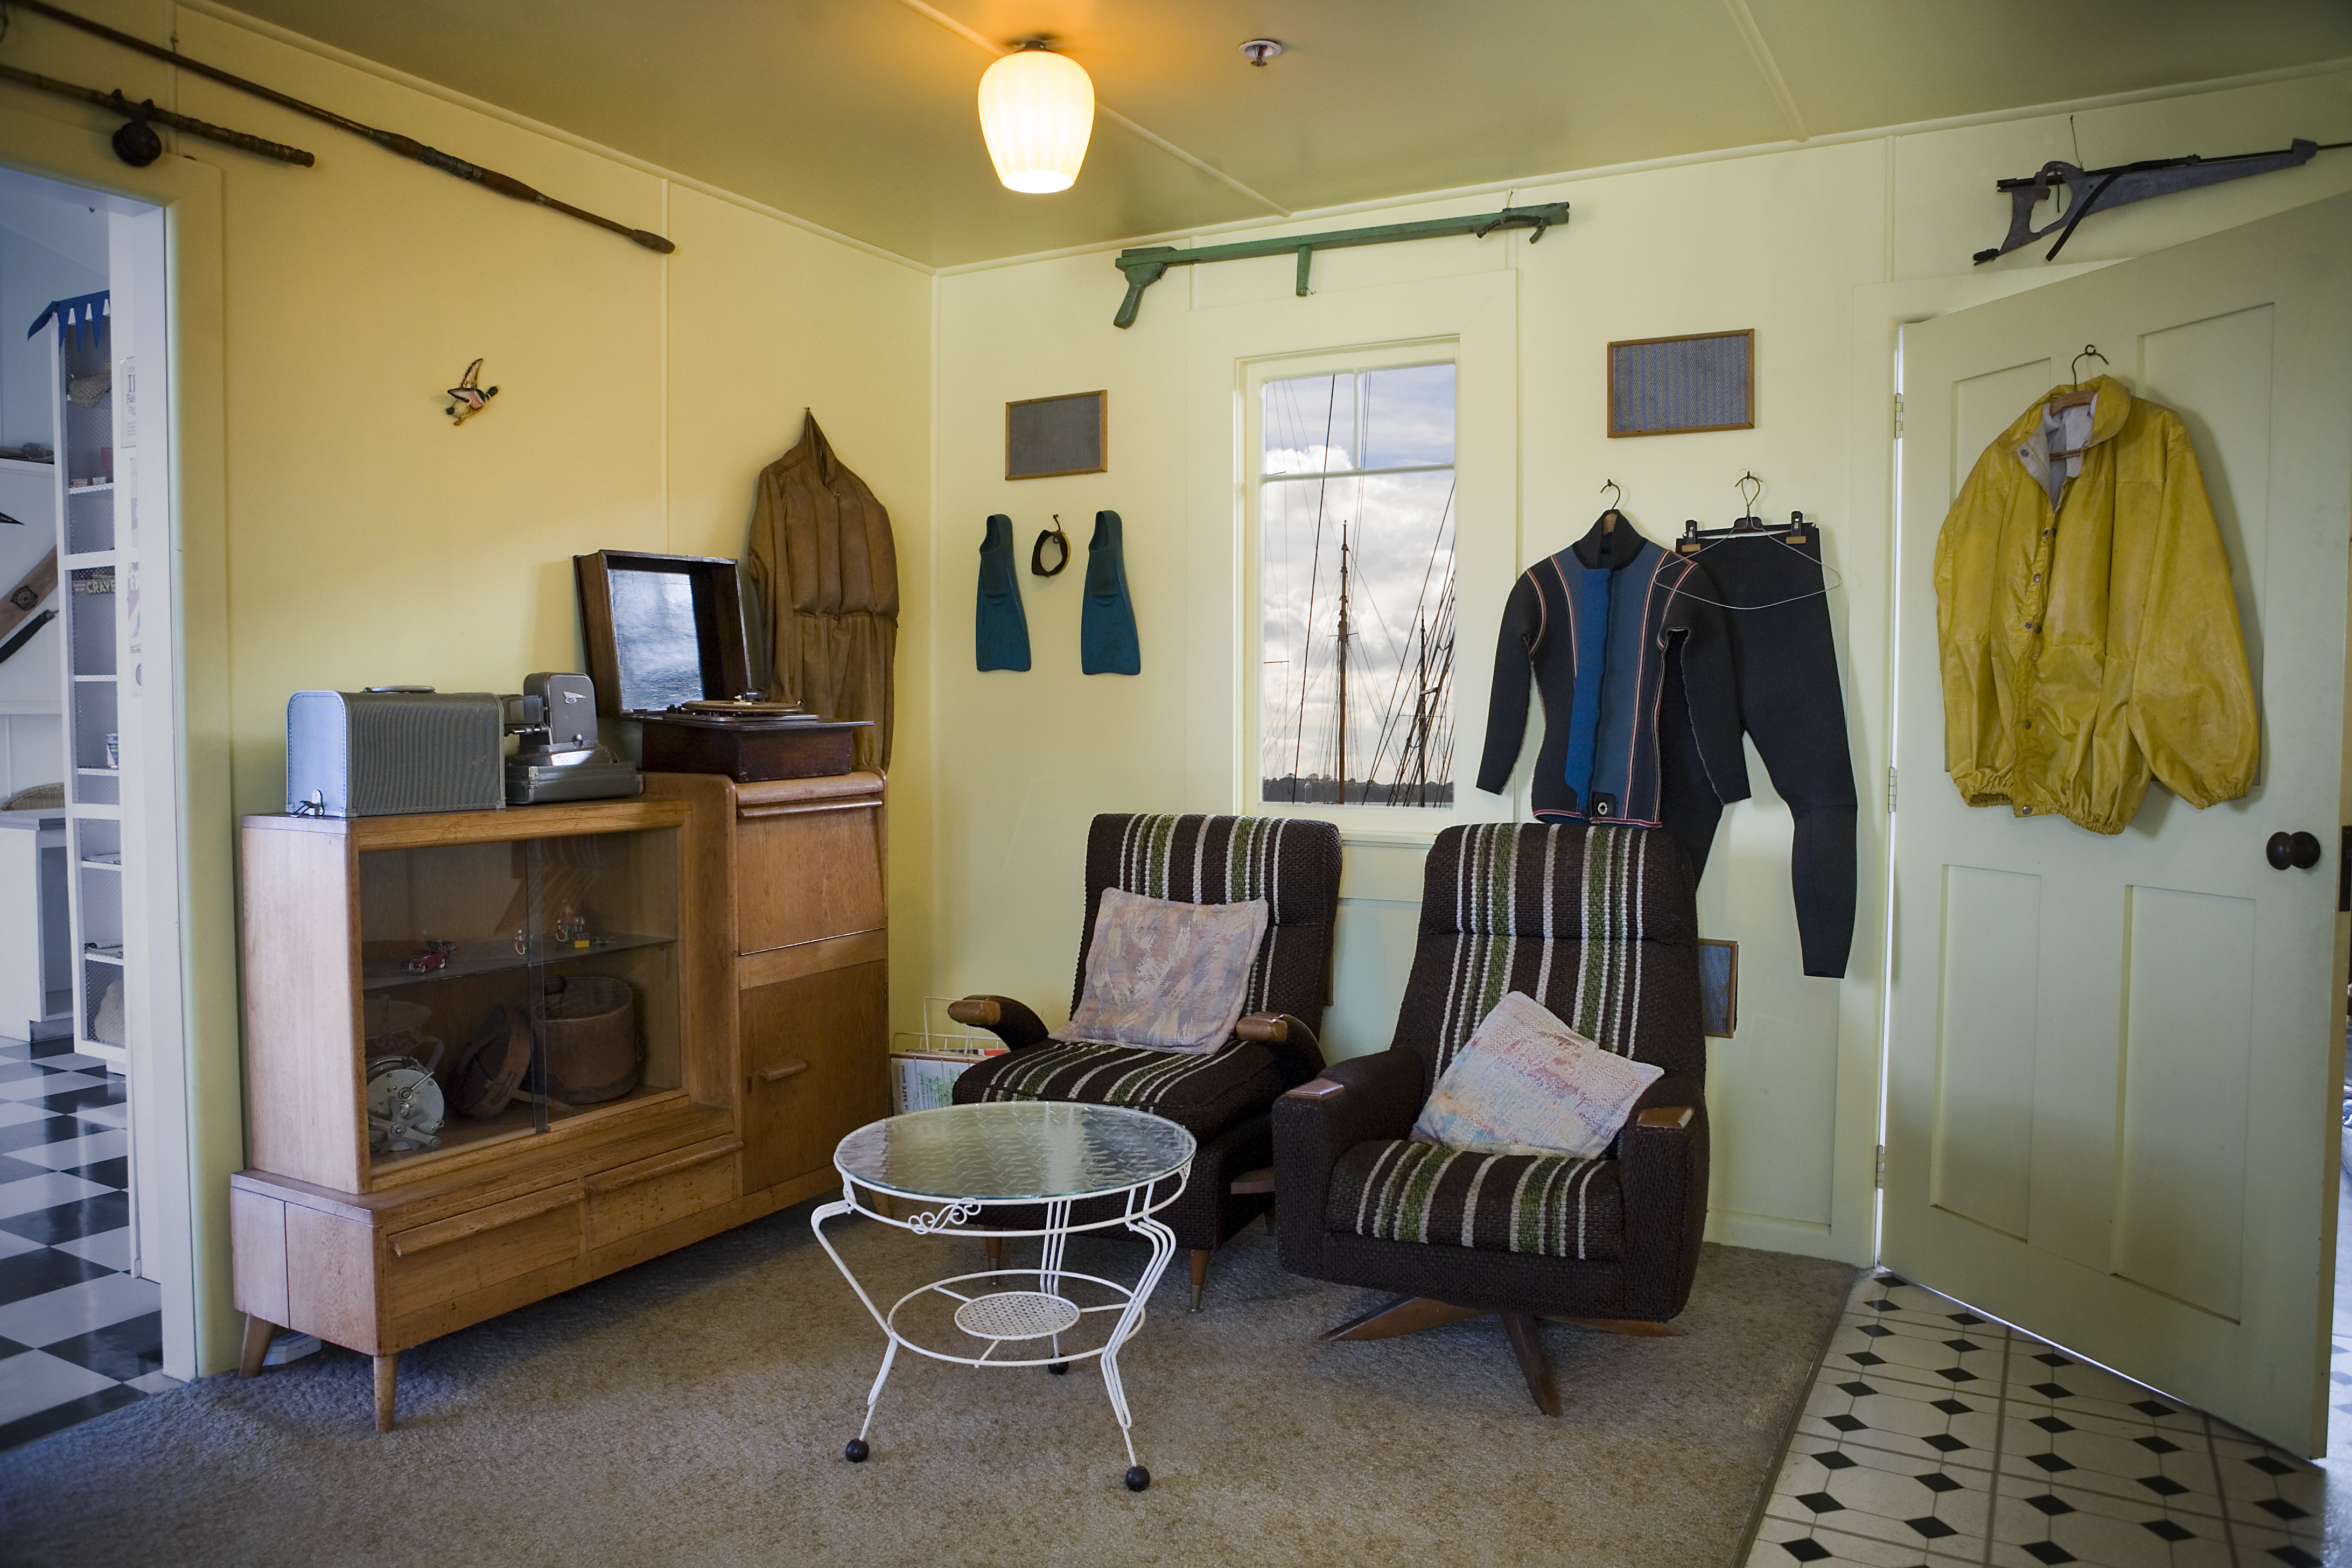 FileFurniture and scuba gear in a beach house Auckland  1032